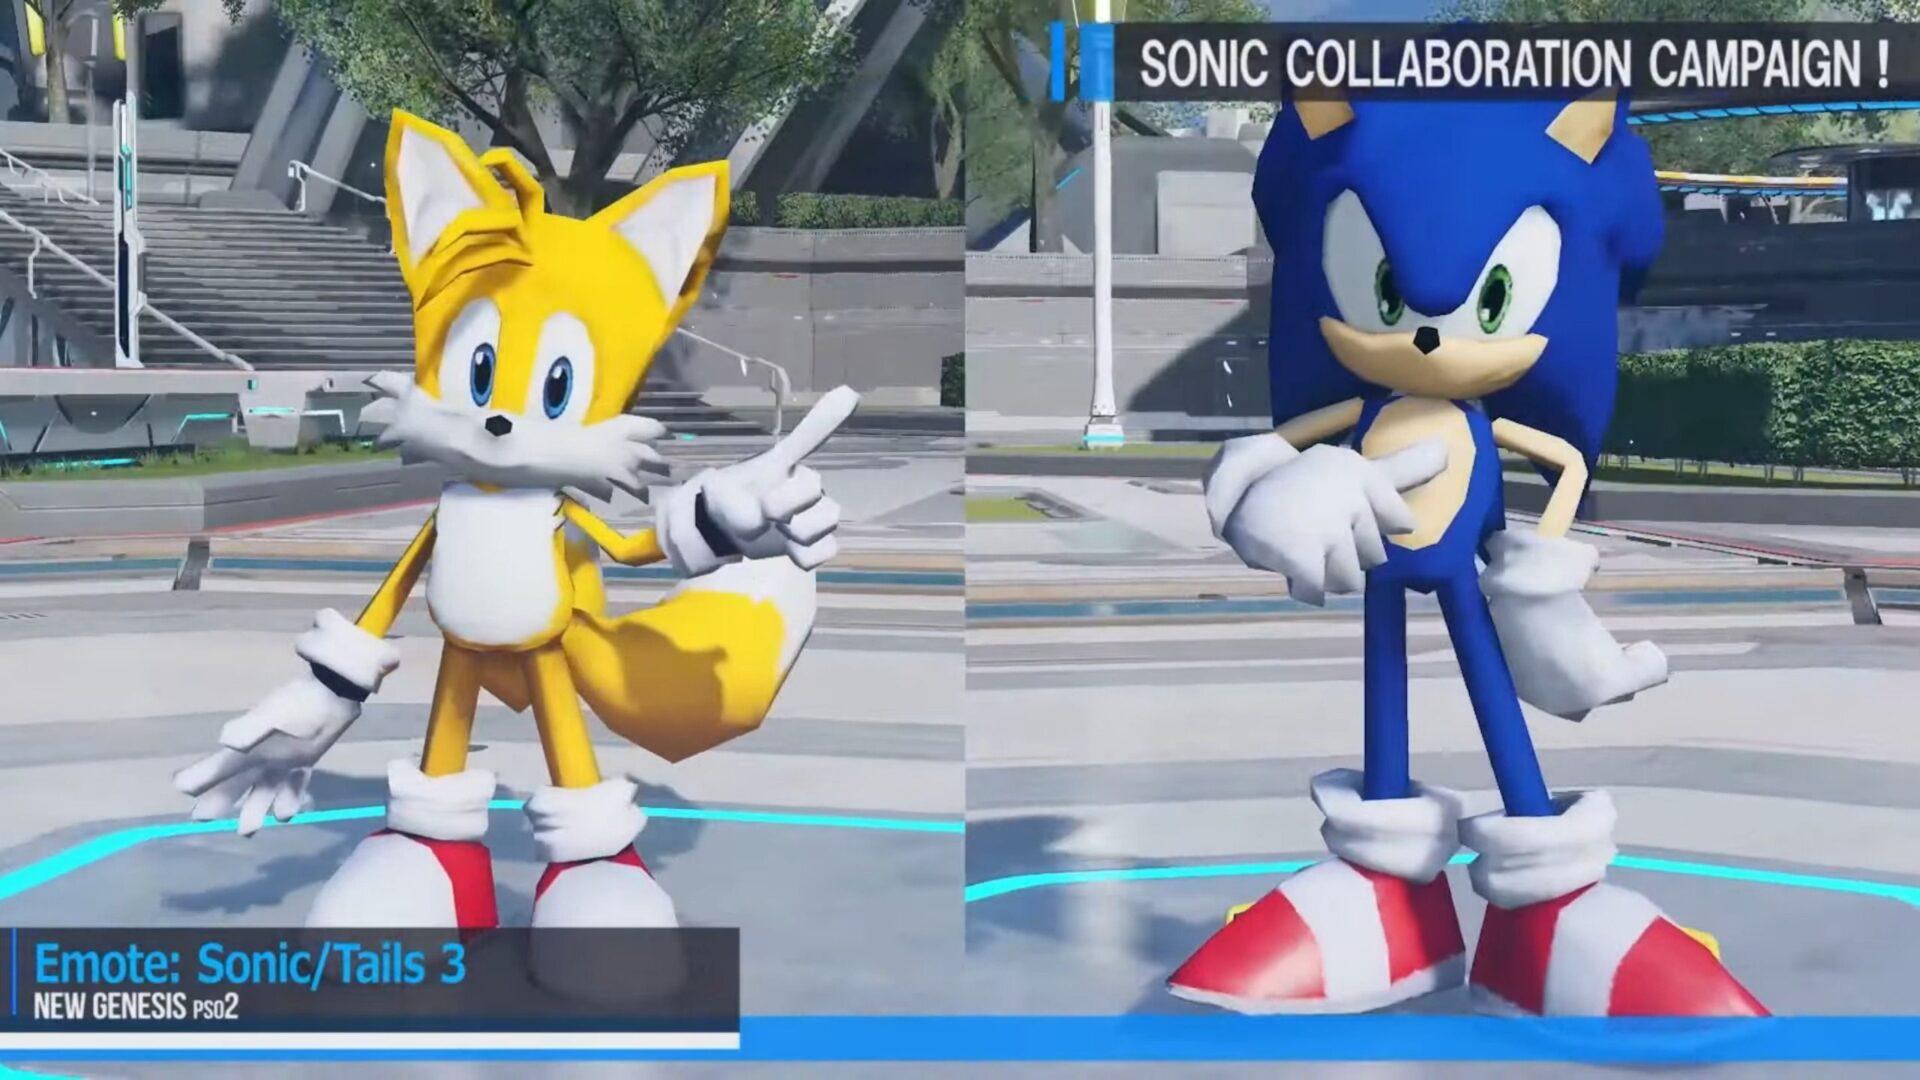 Phantasy Star Online New Genesis Sonic Event